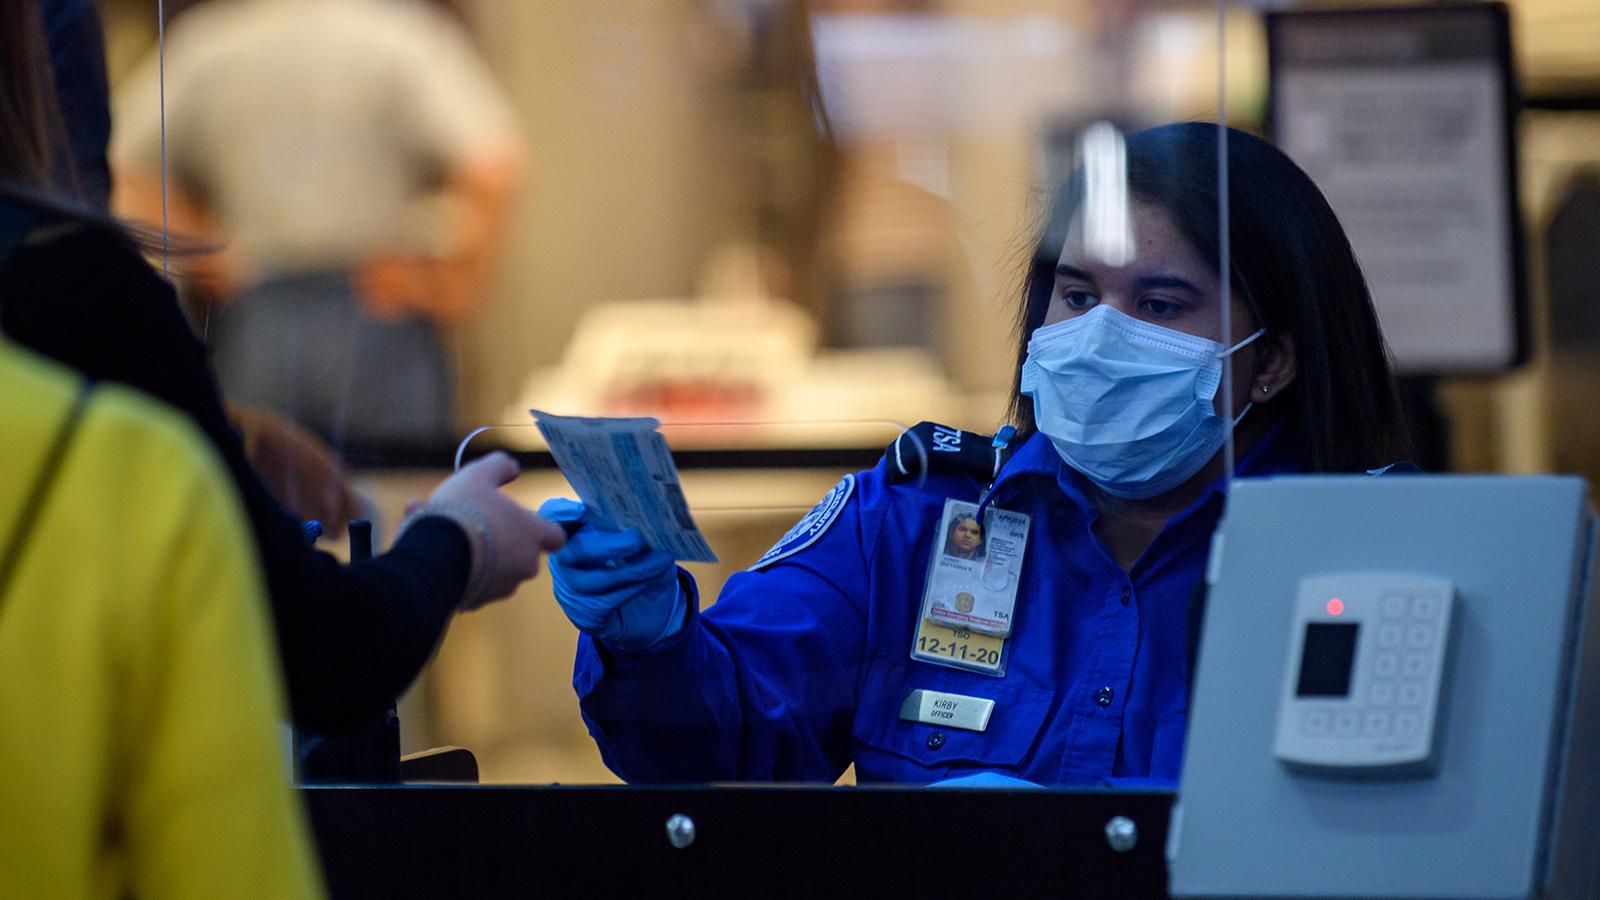 TSA screened 2.7 million people over holiday weekend